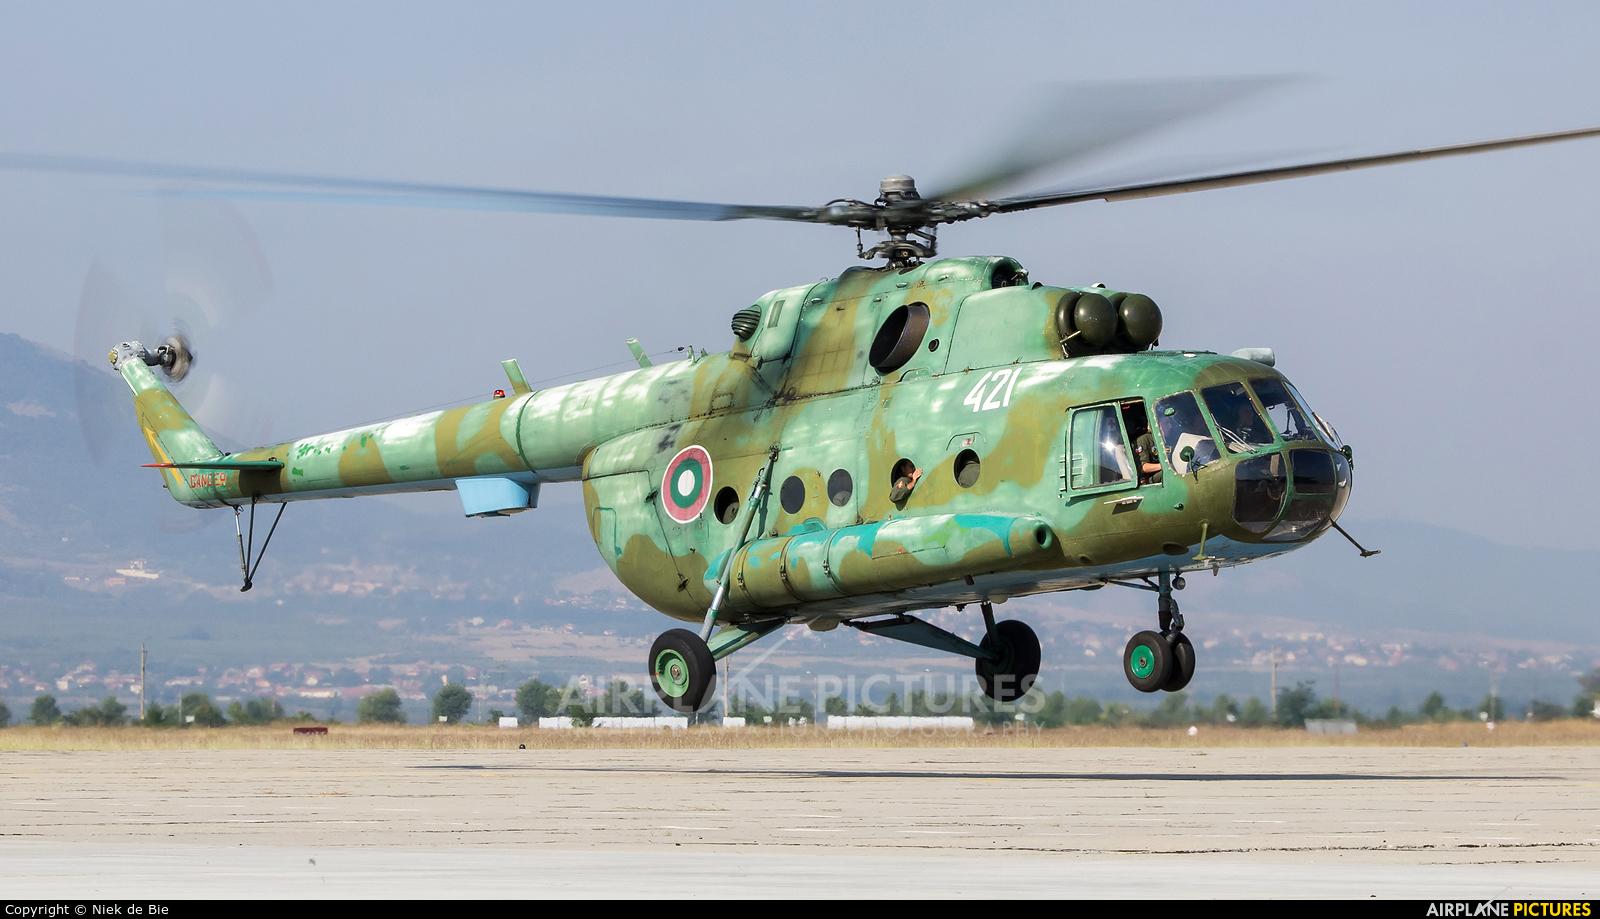 Bulgaria - Air Force 421 aircraft at Plovdiv - Krumovo